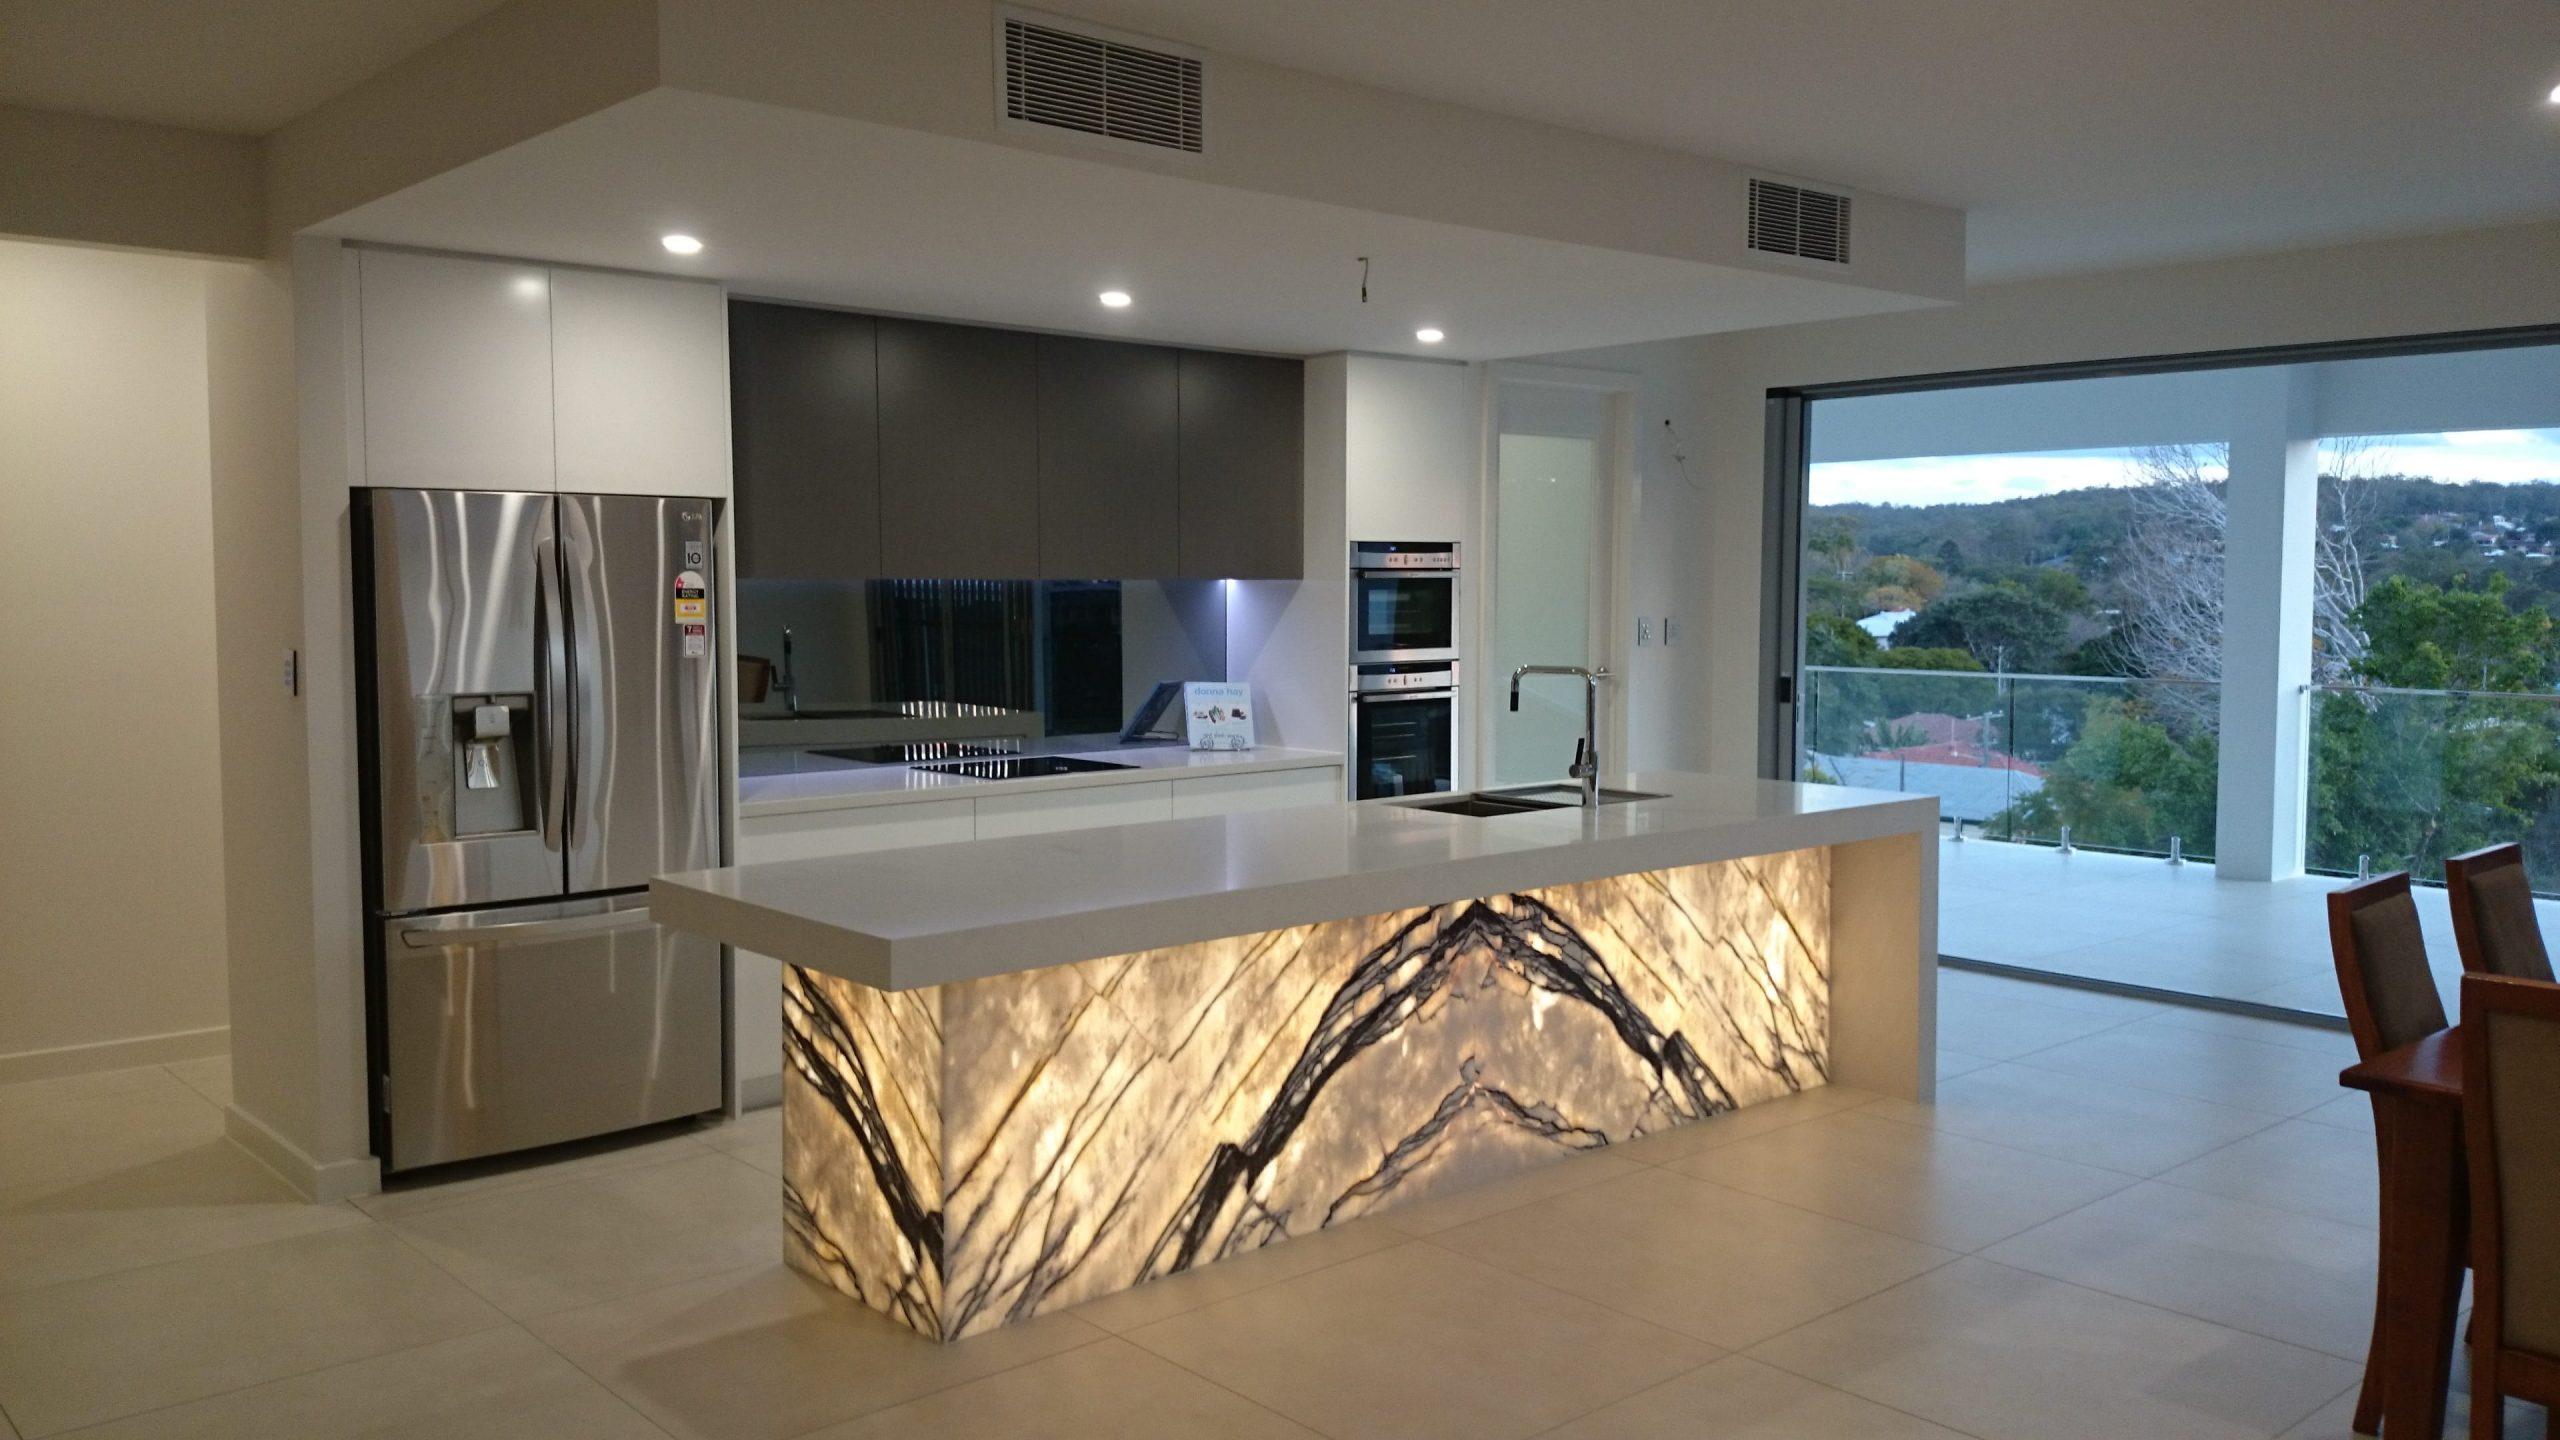 New York - C/- Designer Kitchens 2 - Project Stone